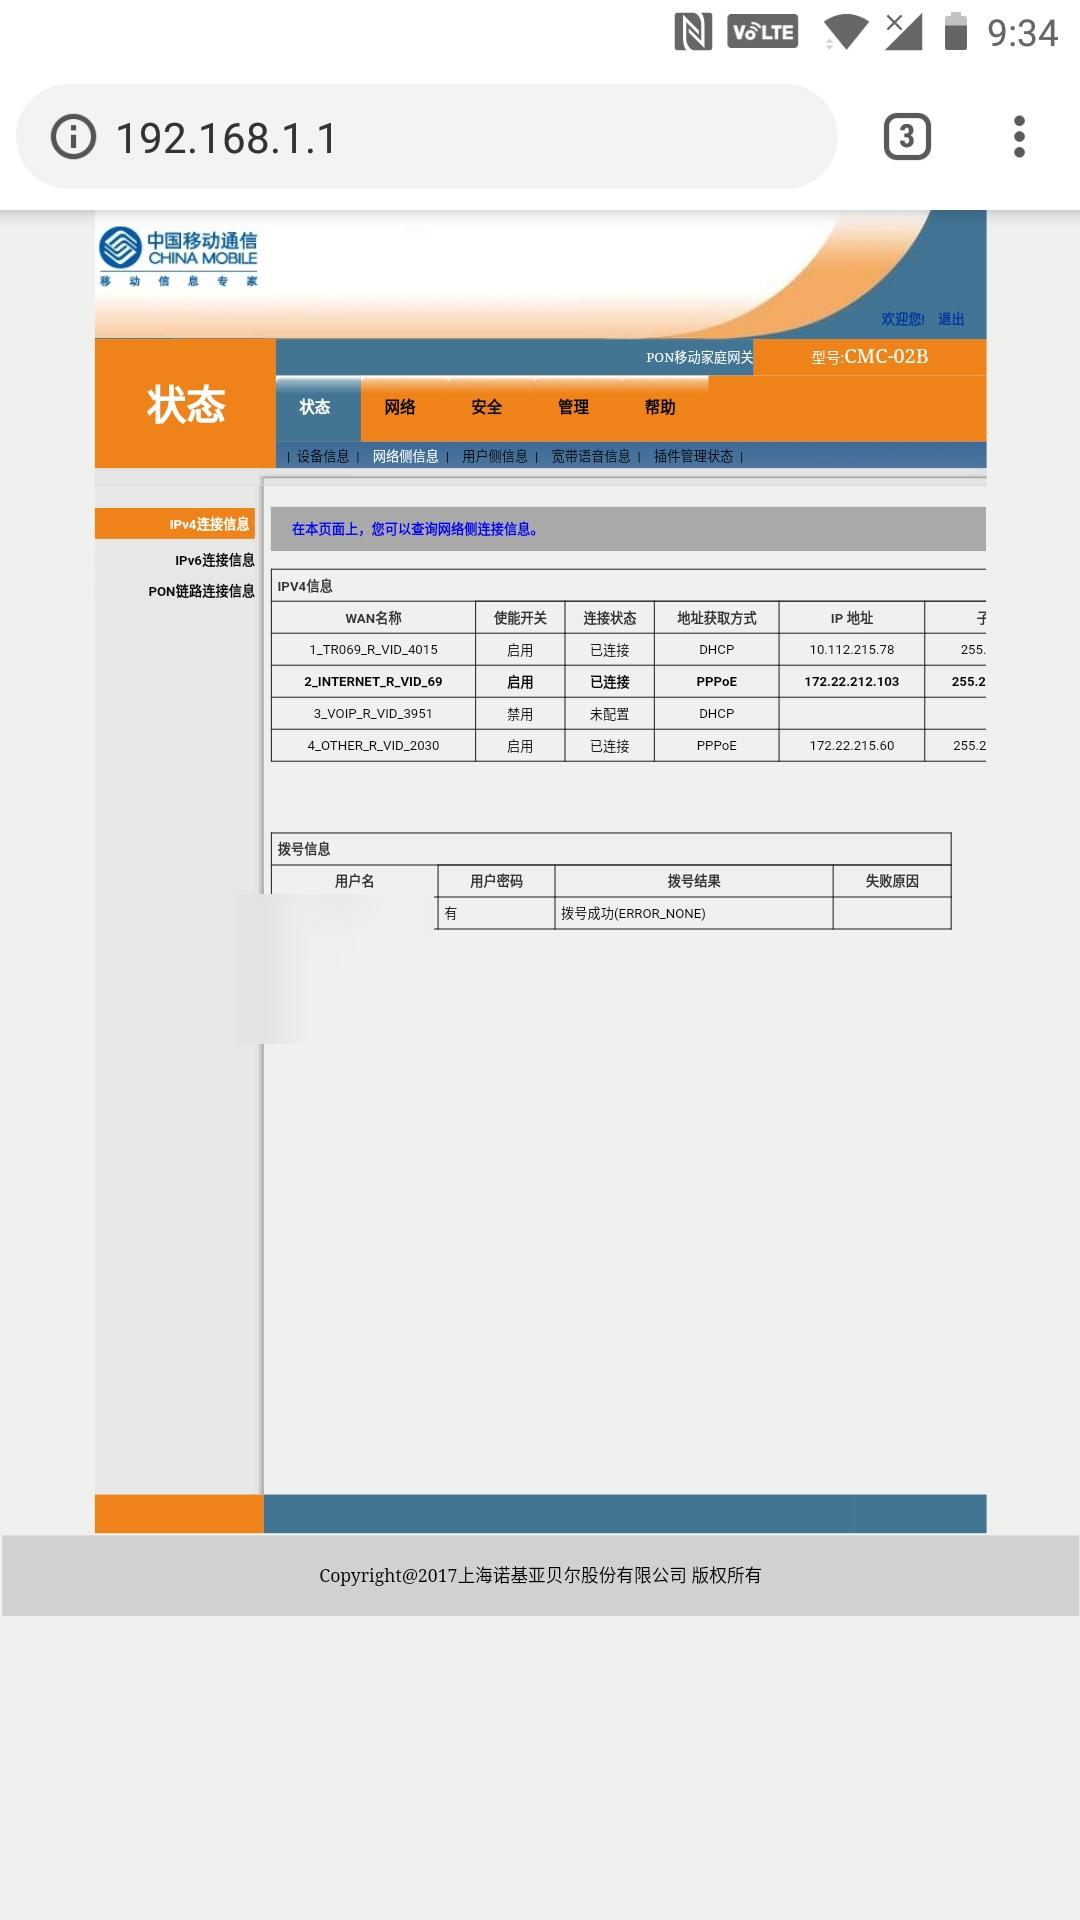 result-2018-07-15-21-35-07.png